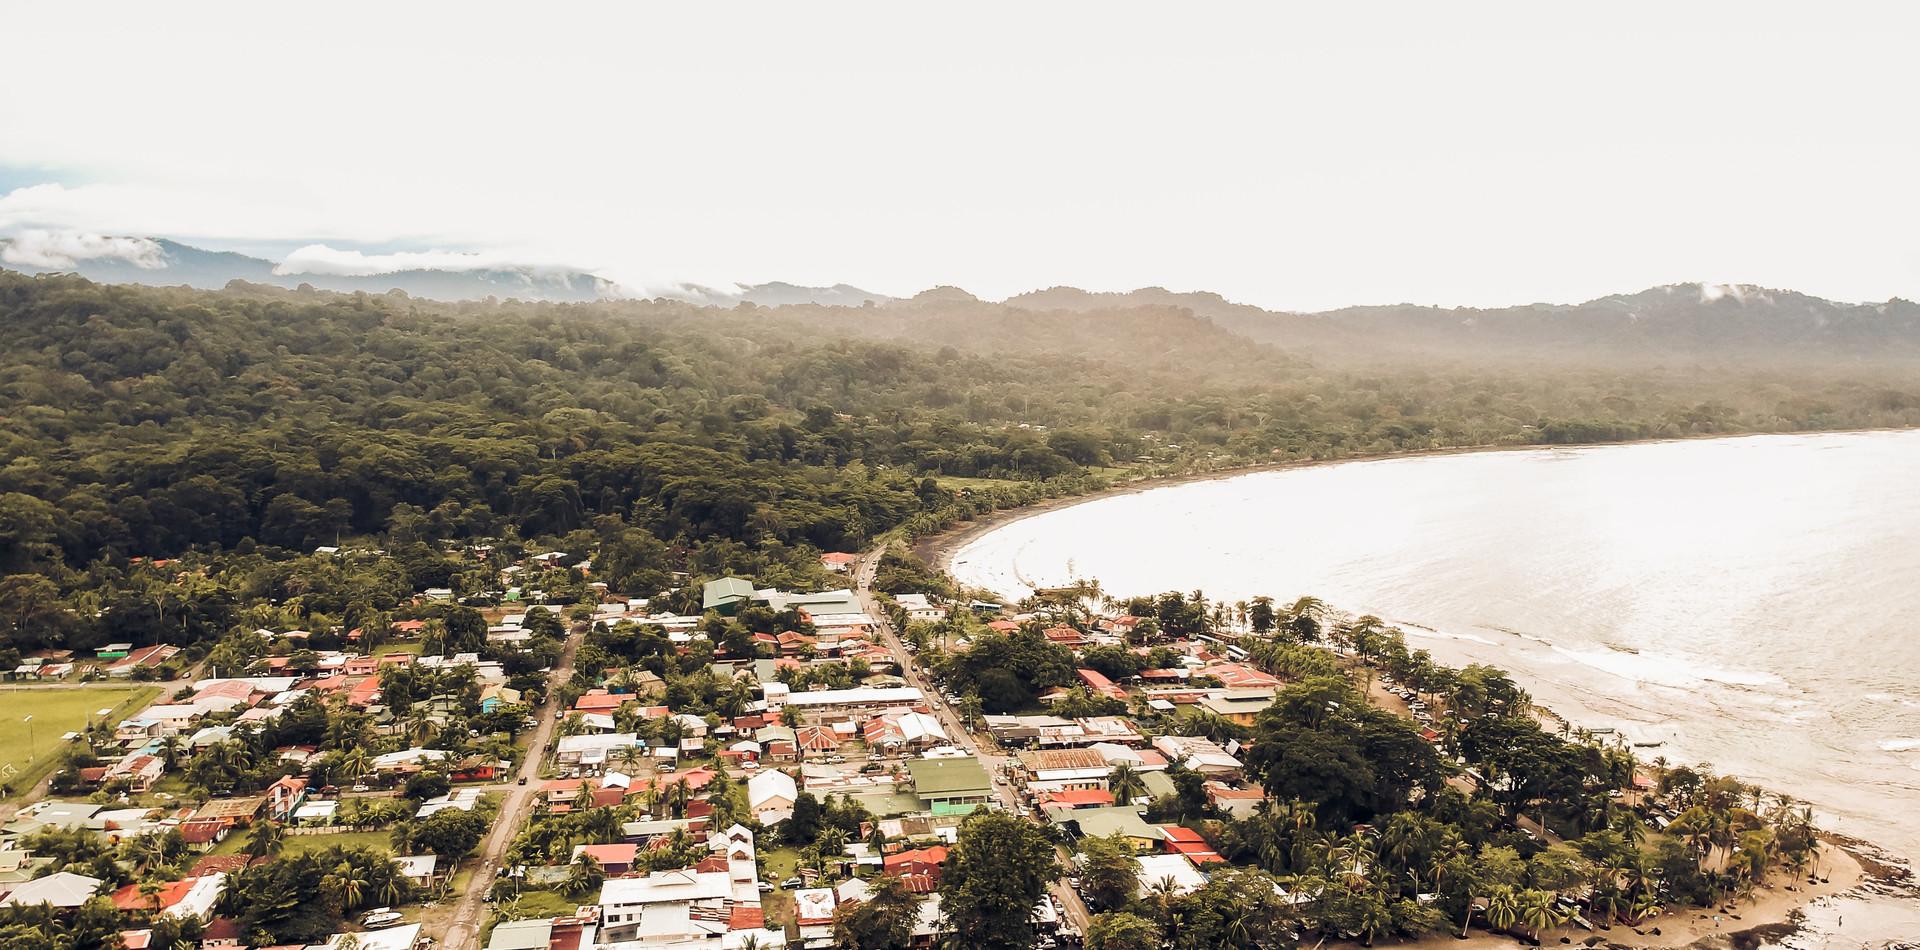 DAY 17 - Cahuita / Puerto Viejo / Manzanillo (±1h30 RT.)